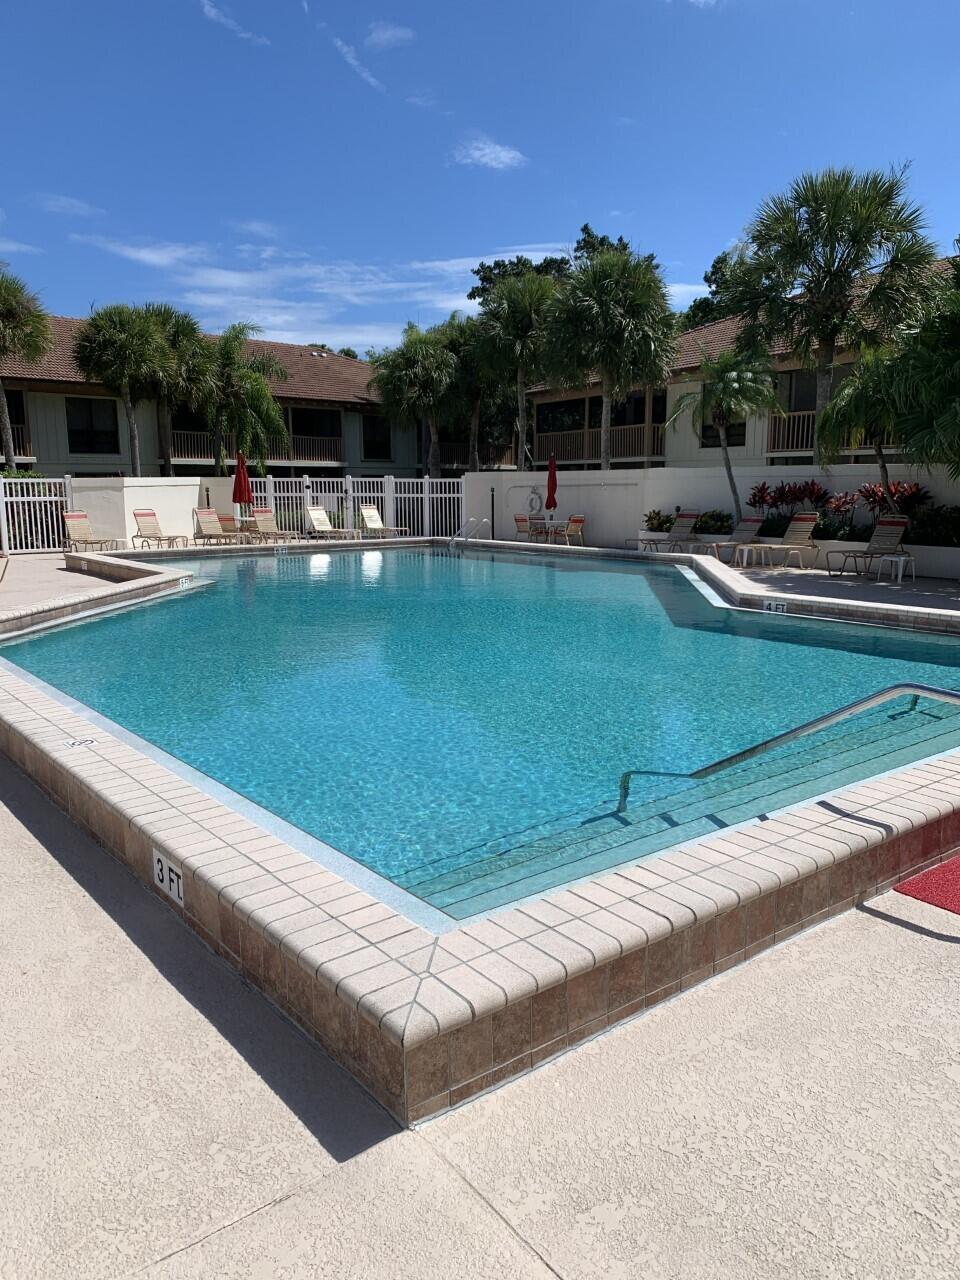 Golf villas pool